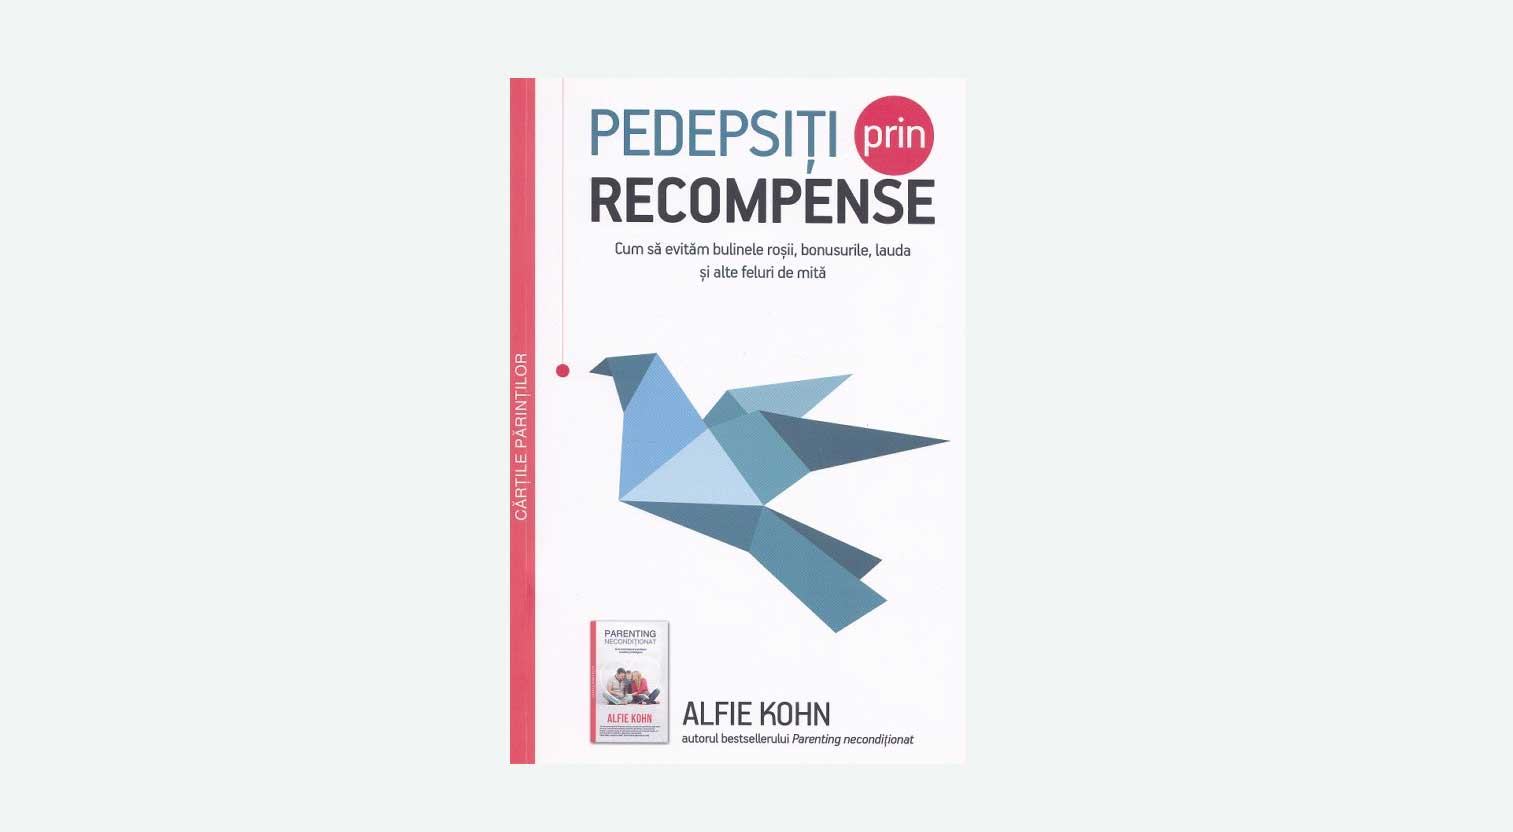 PEDEPSITI PRIN RECOMPENSE